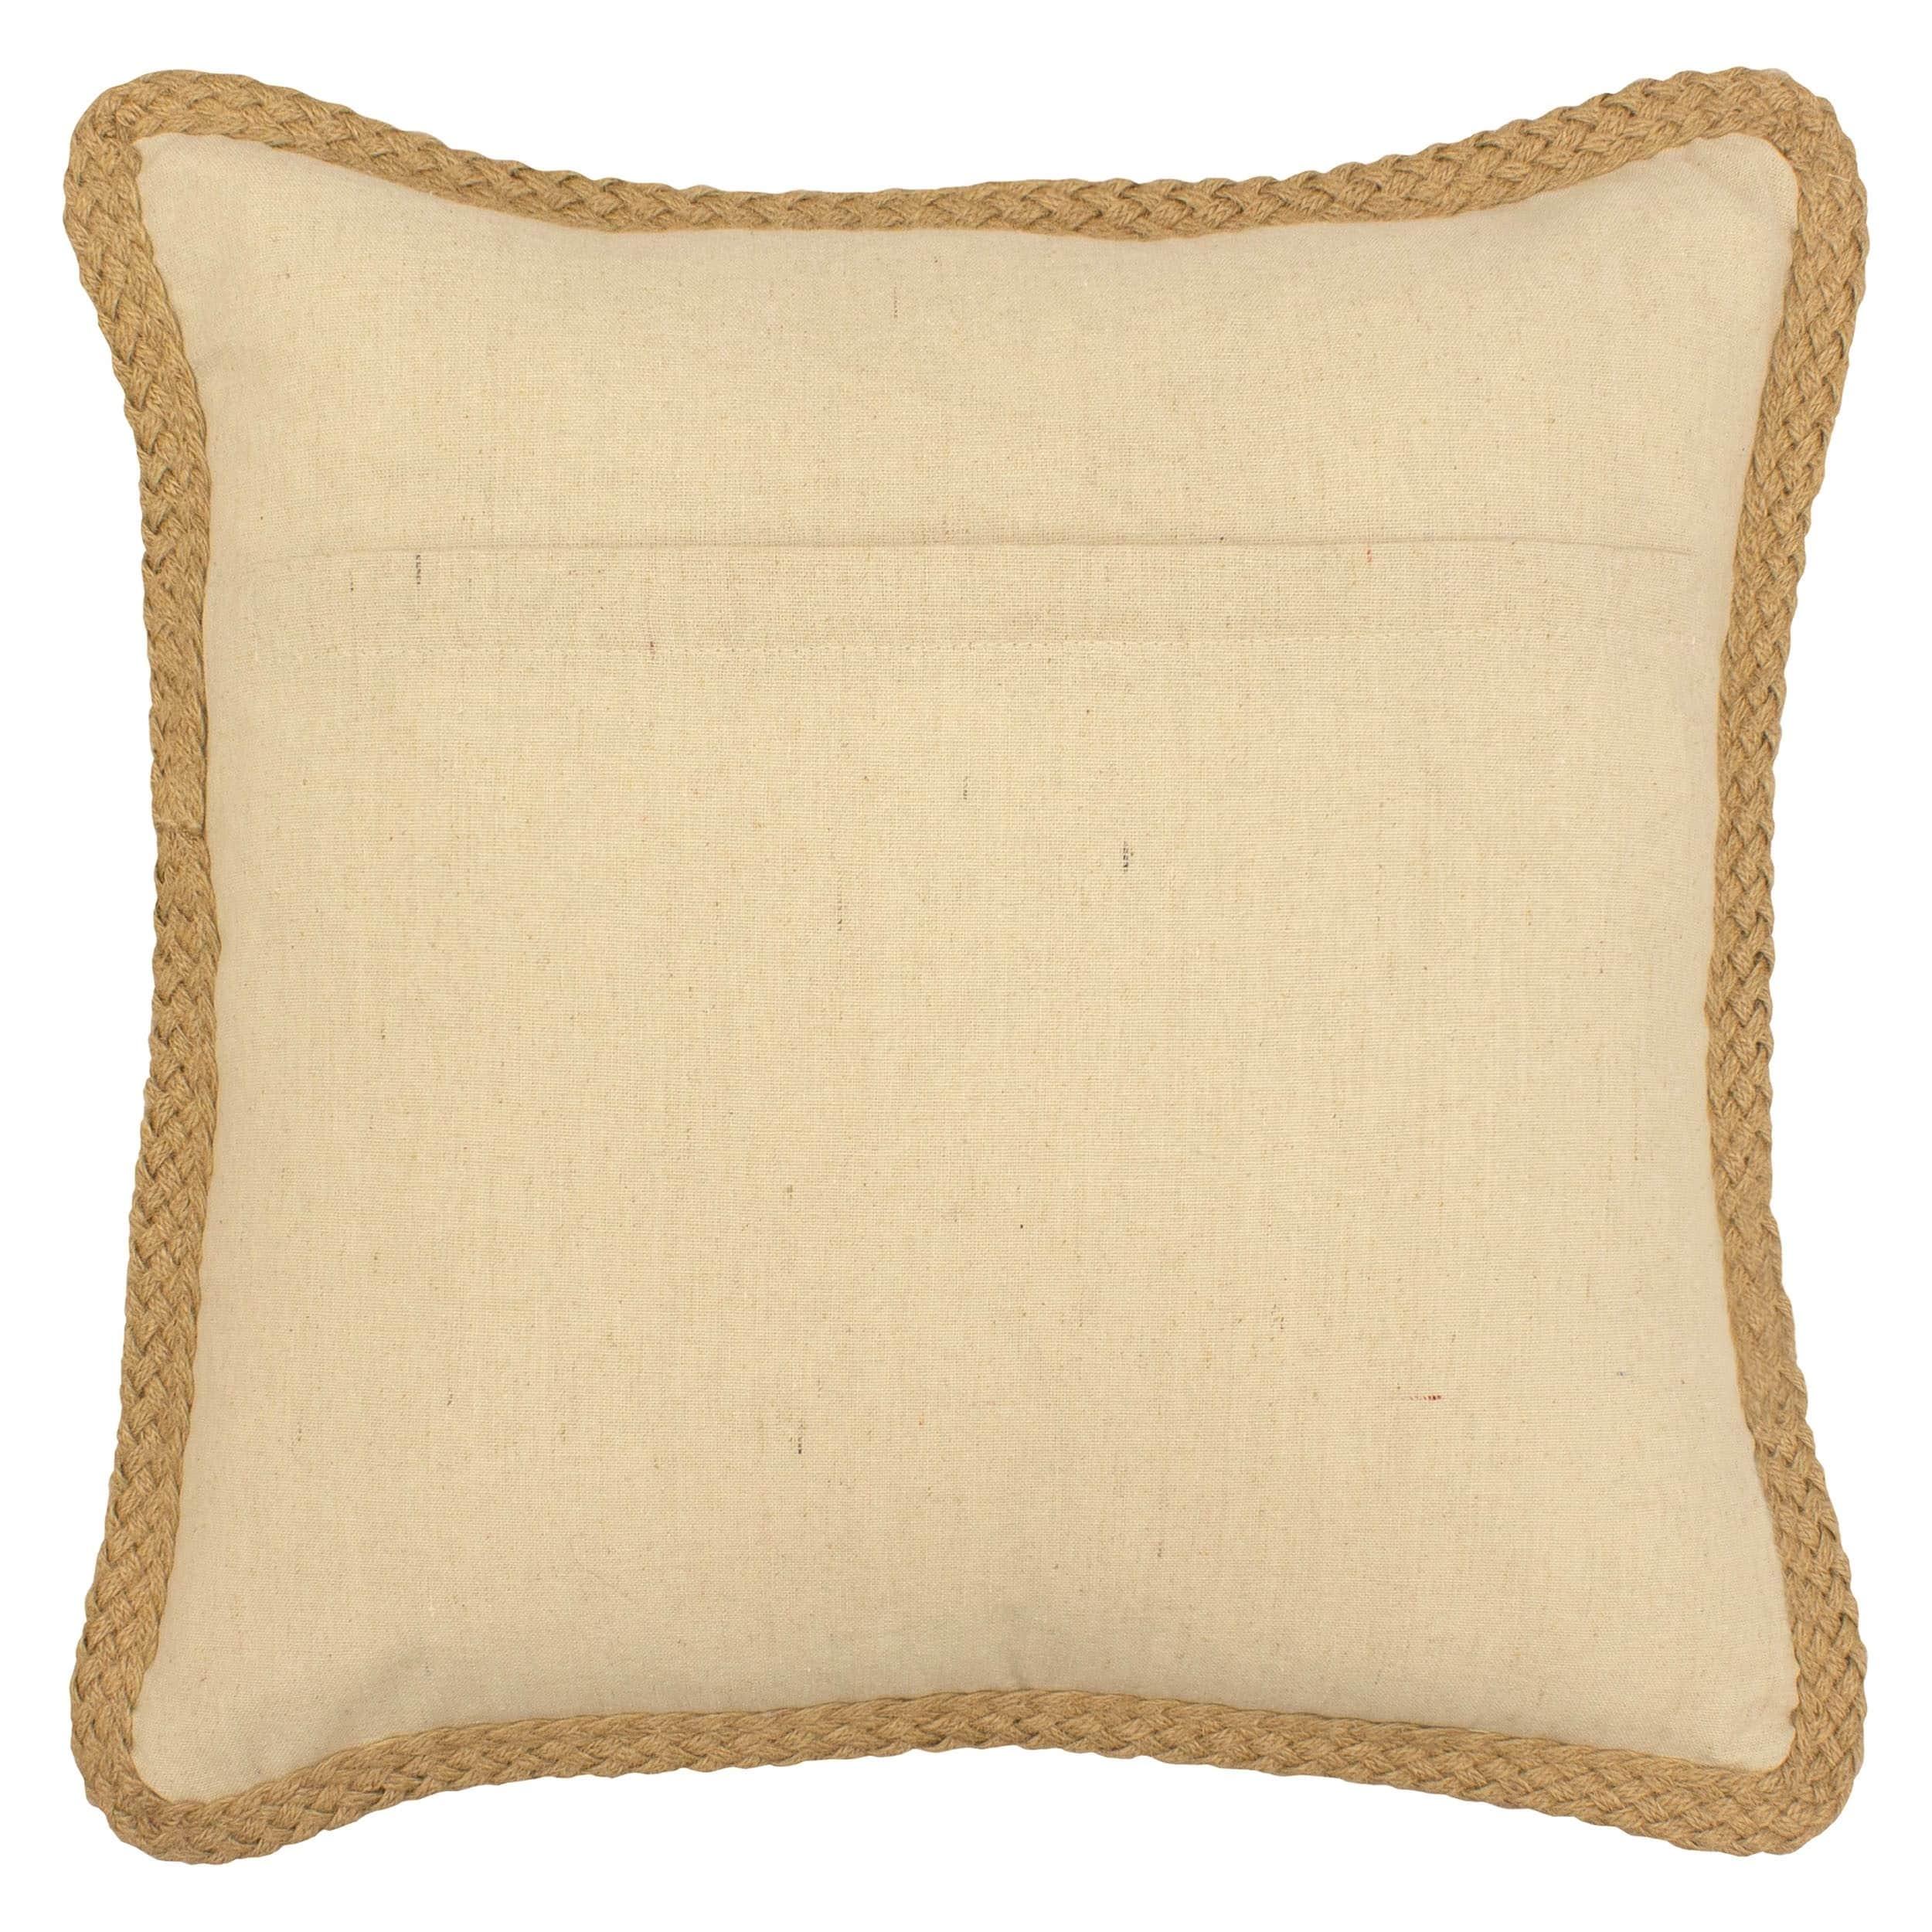 Shop Boho Living Mandalay Decorative Lumbar Pillow   Free Shipping On  Orders Over $45   Overstock.com   21545907